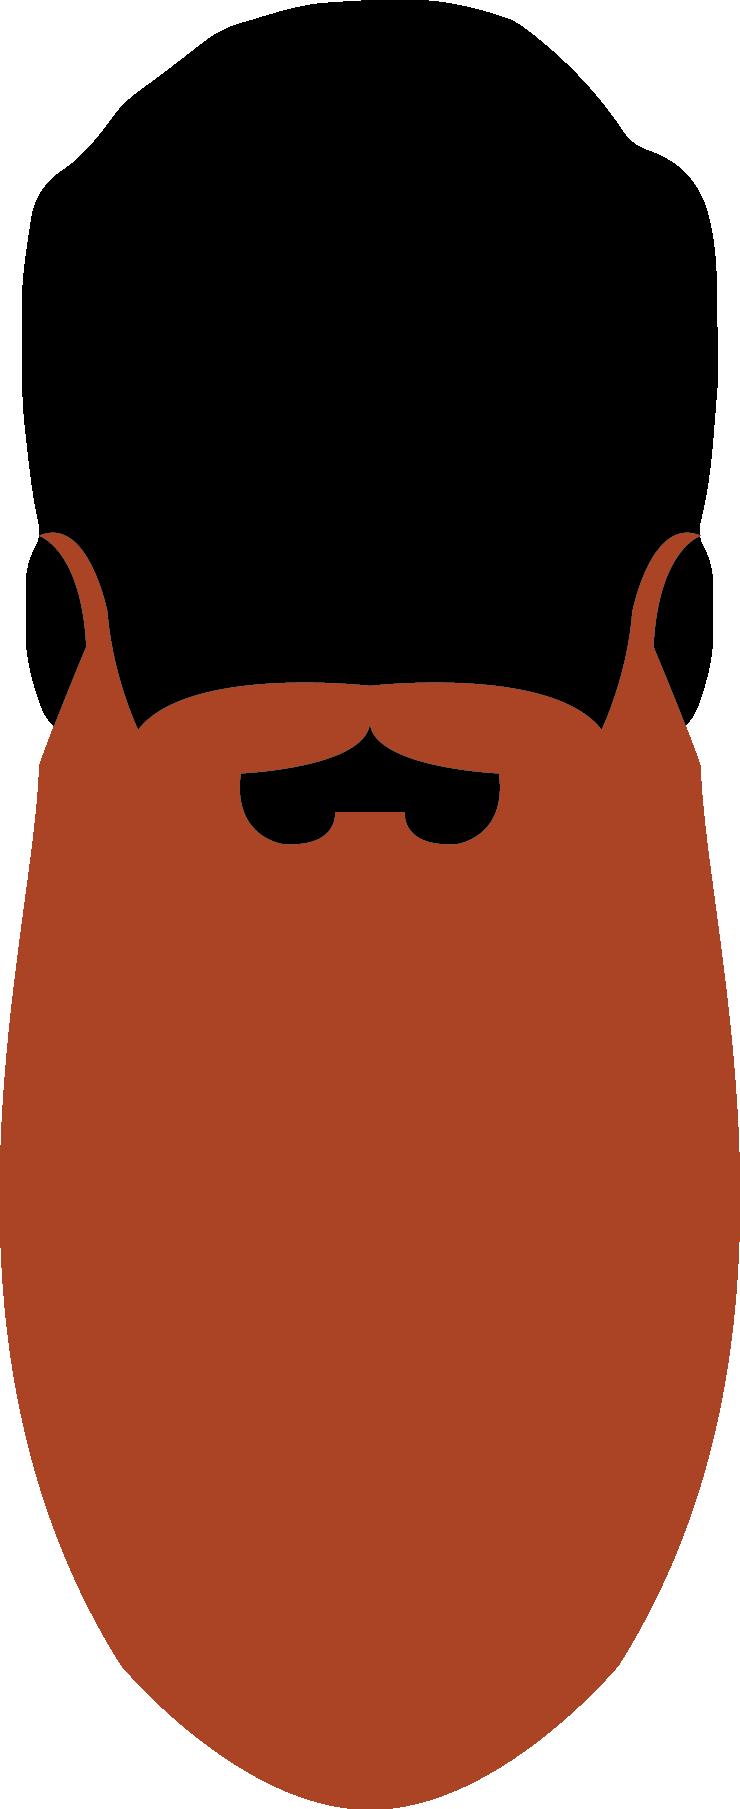 19. Natural Full Beard 45cm